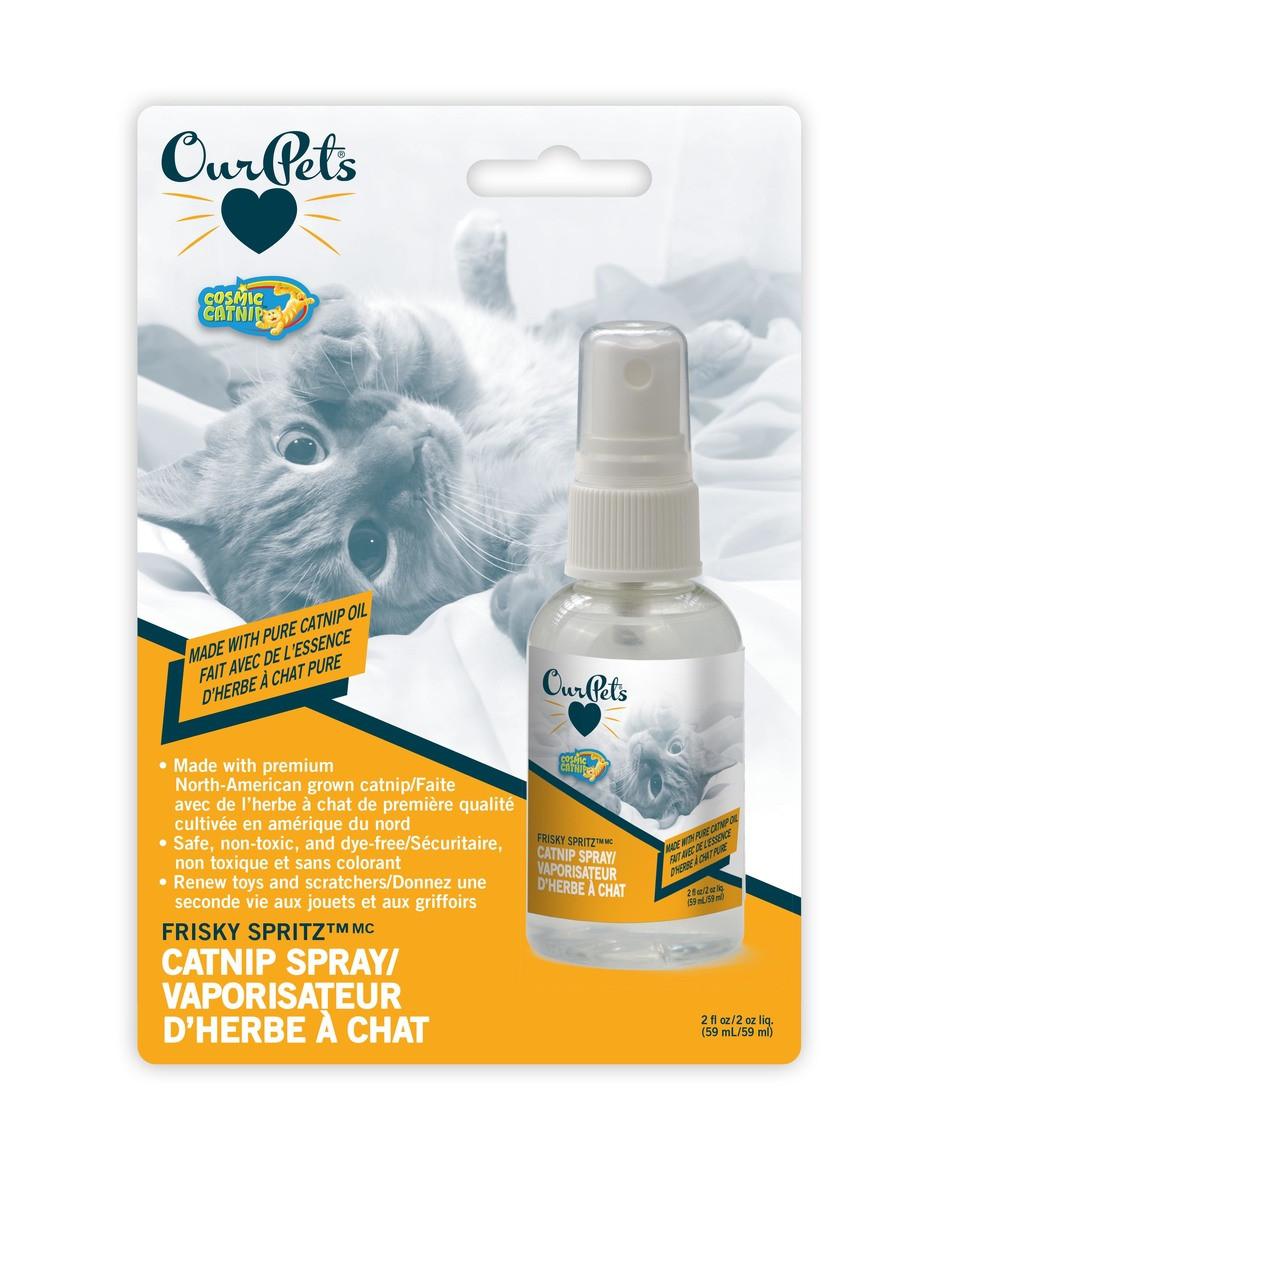 OurPets Frisky Spritz Catnip Spray